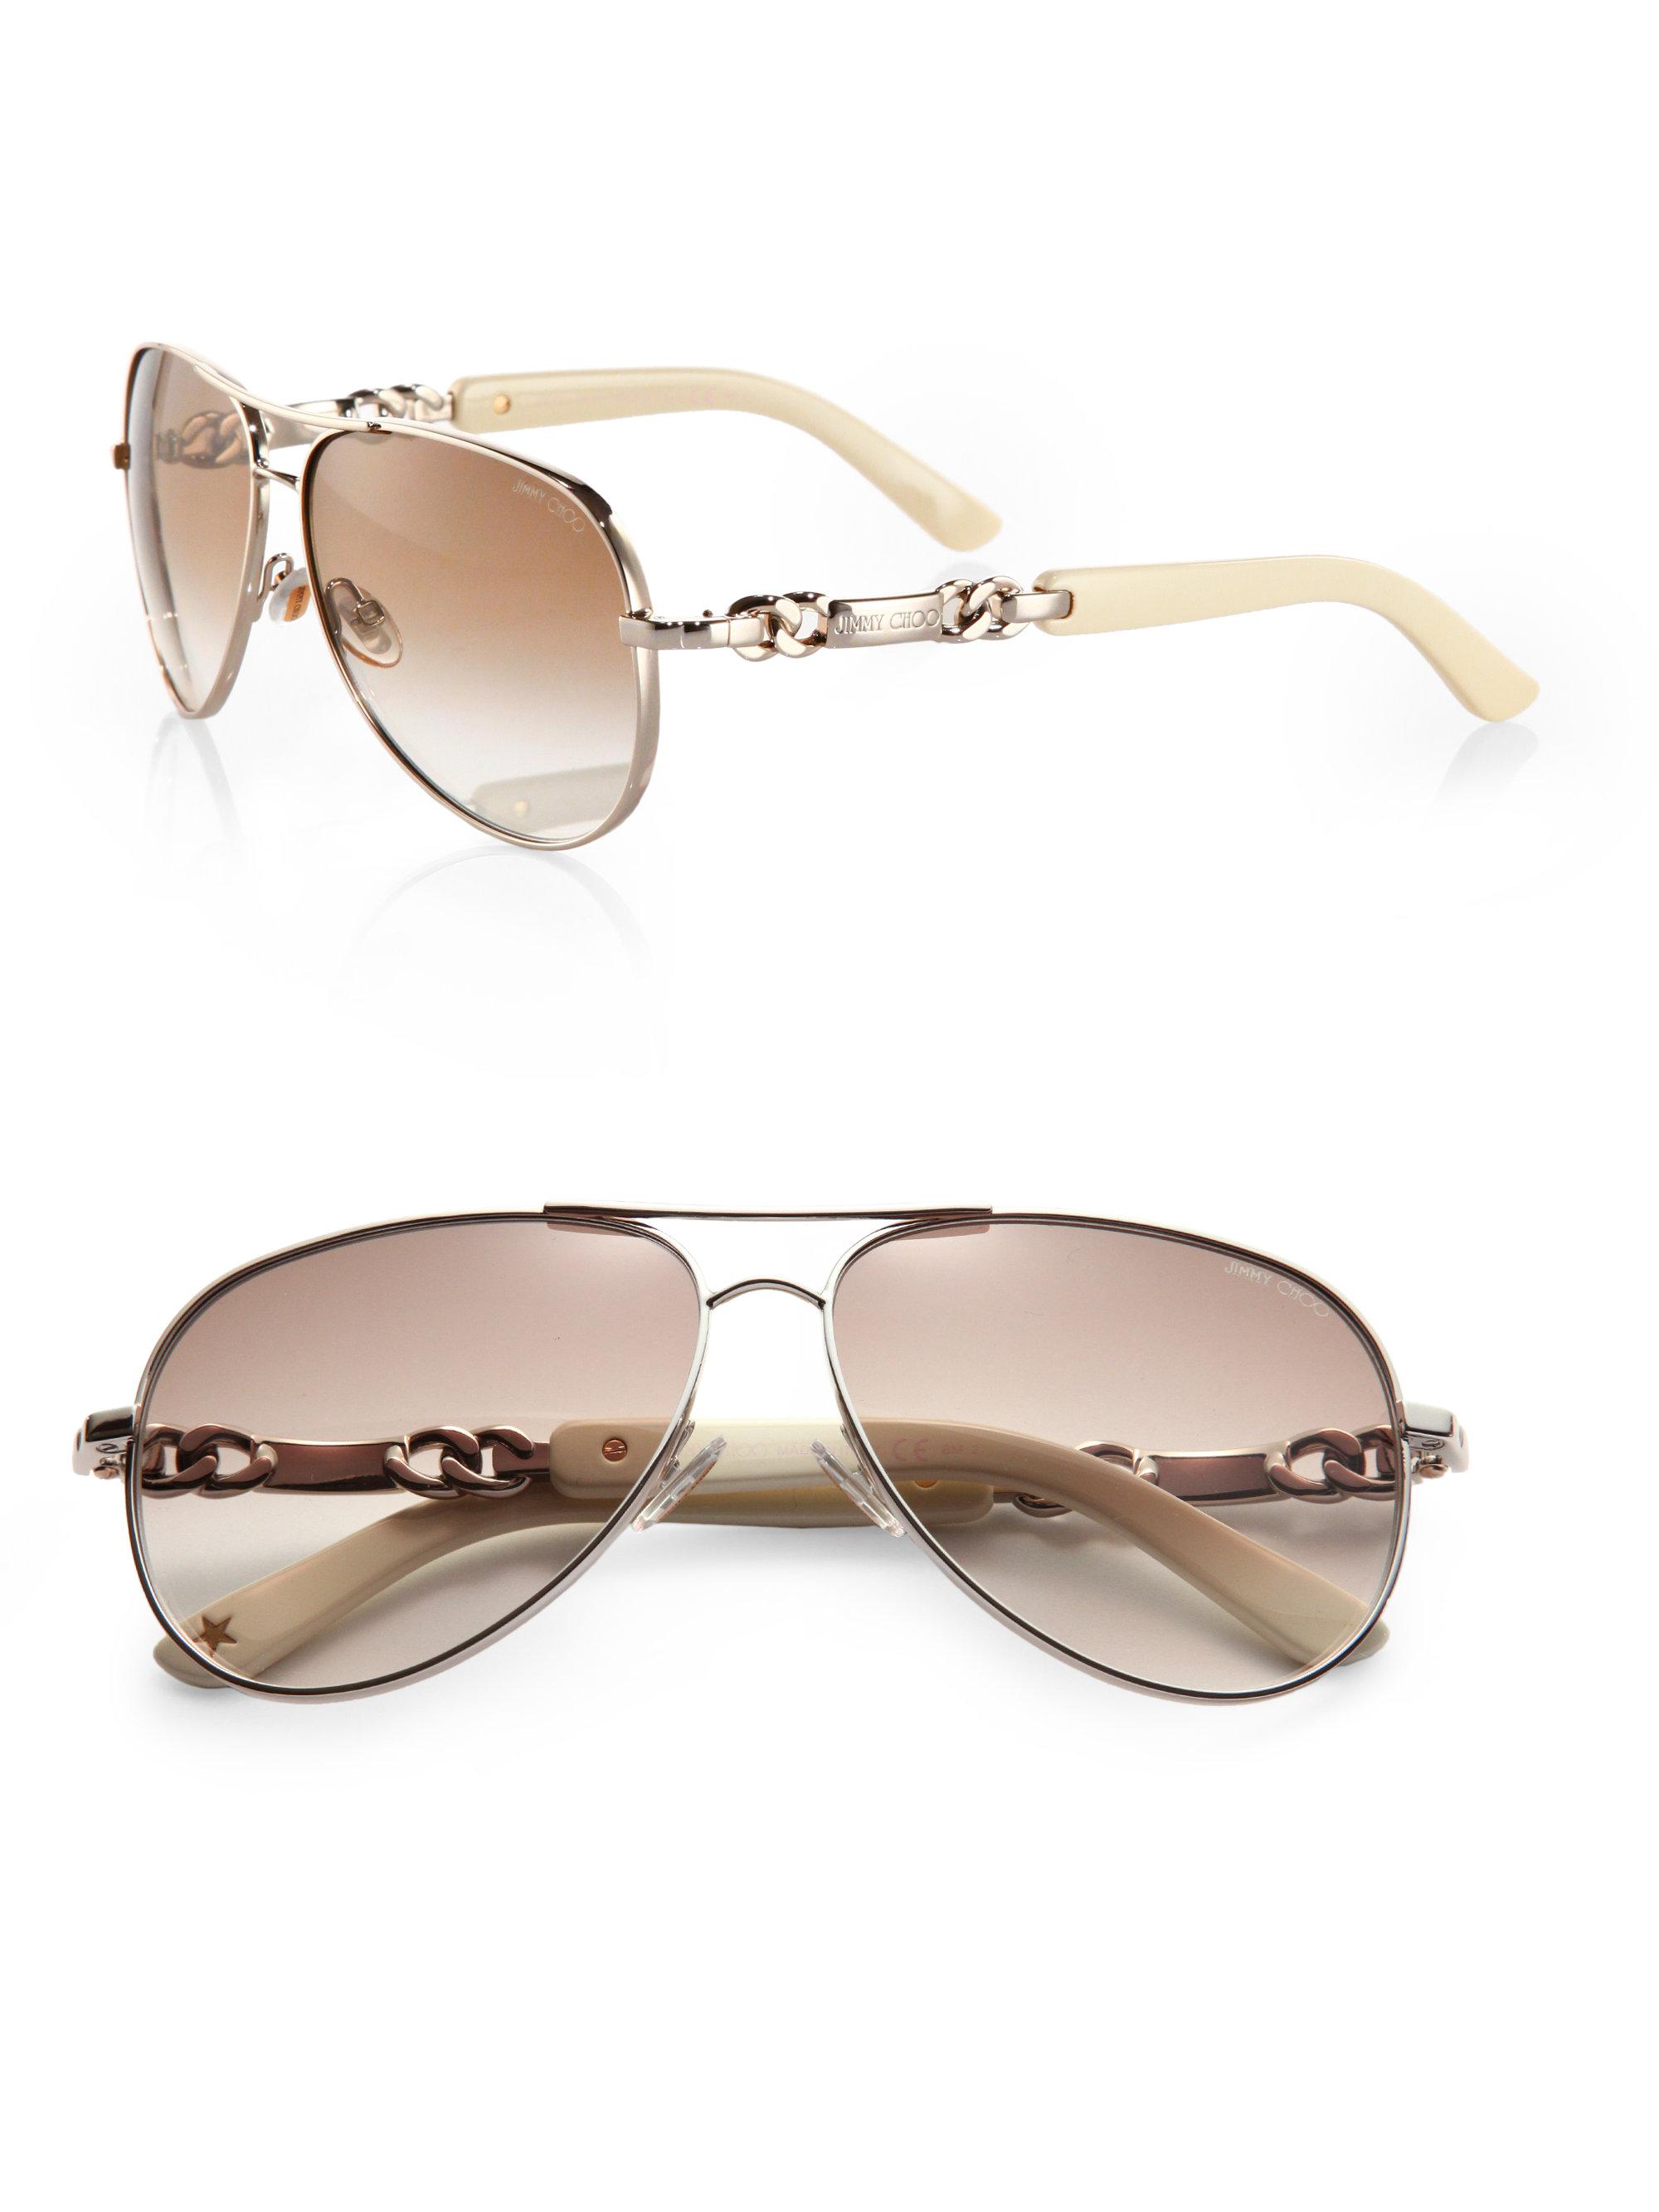 3619f54ad16 Lyst - Jimmy Choo Reese Aviator Sunglasses in Metallic